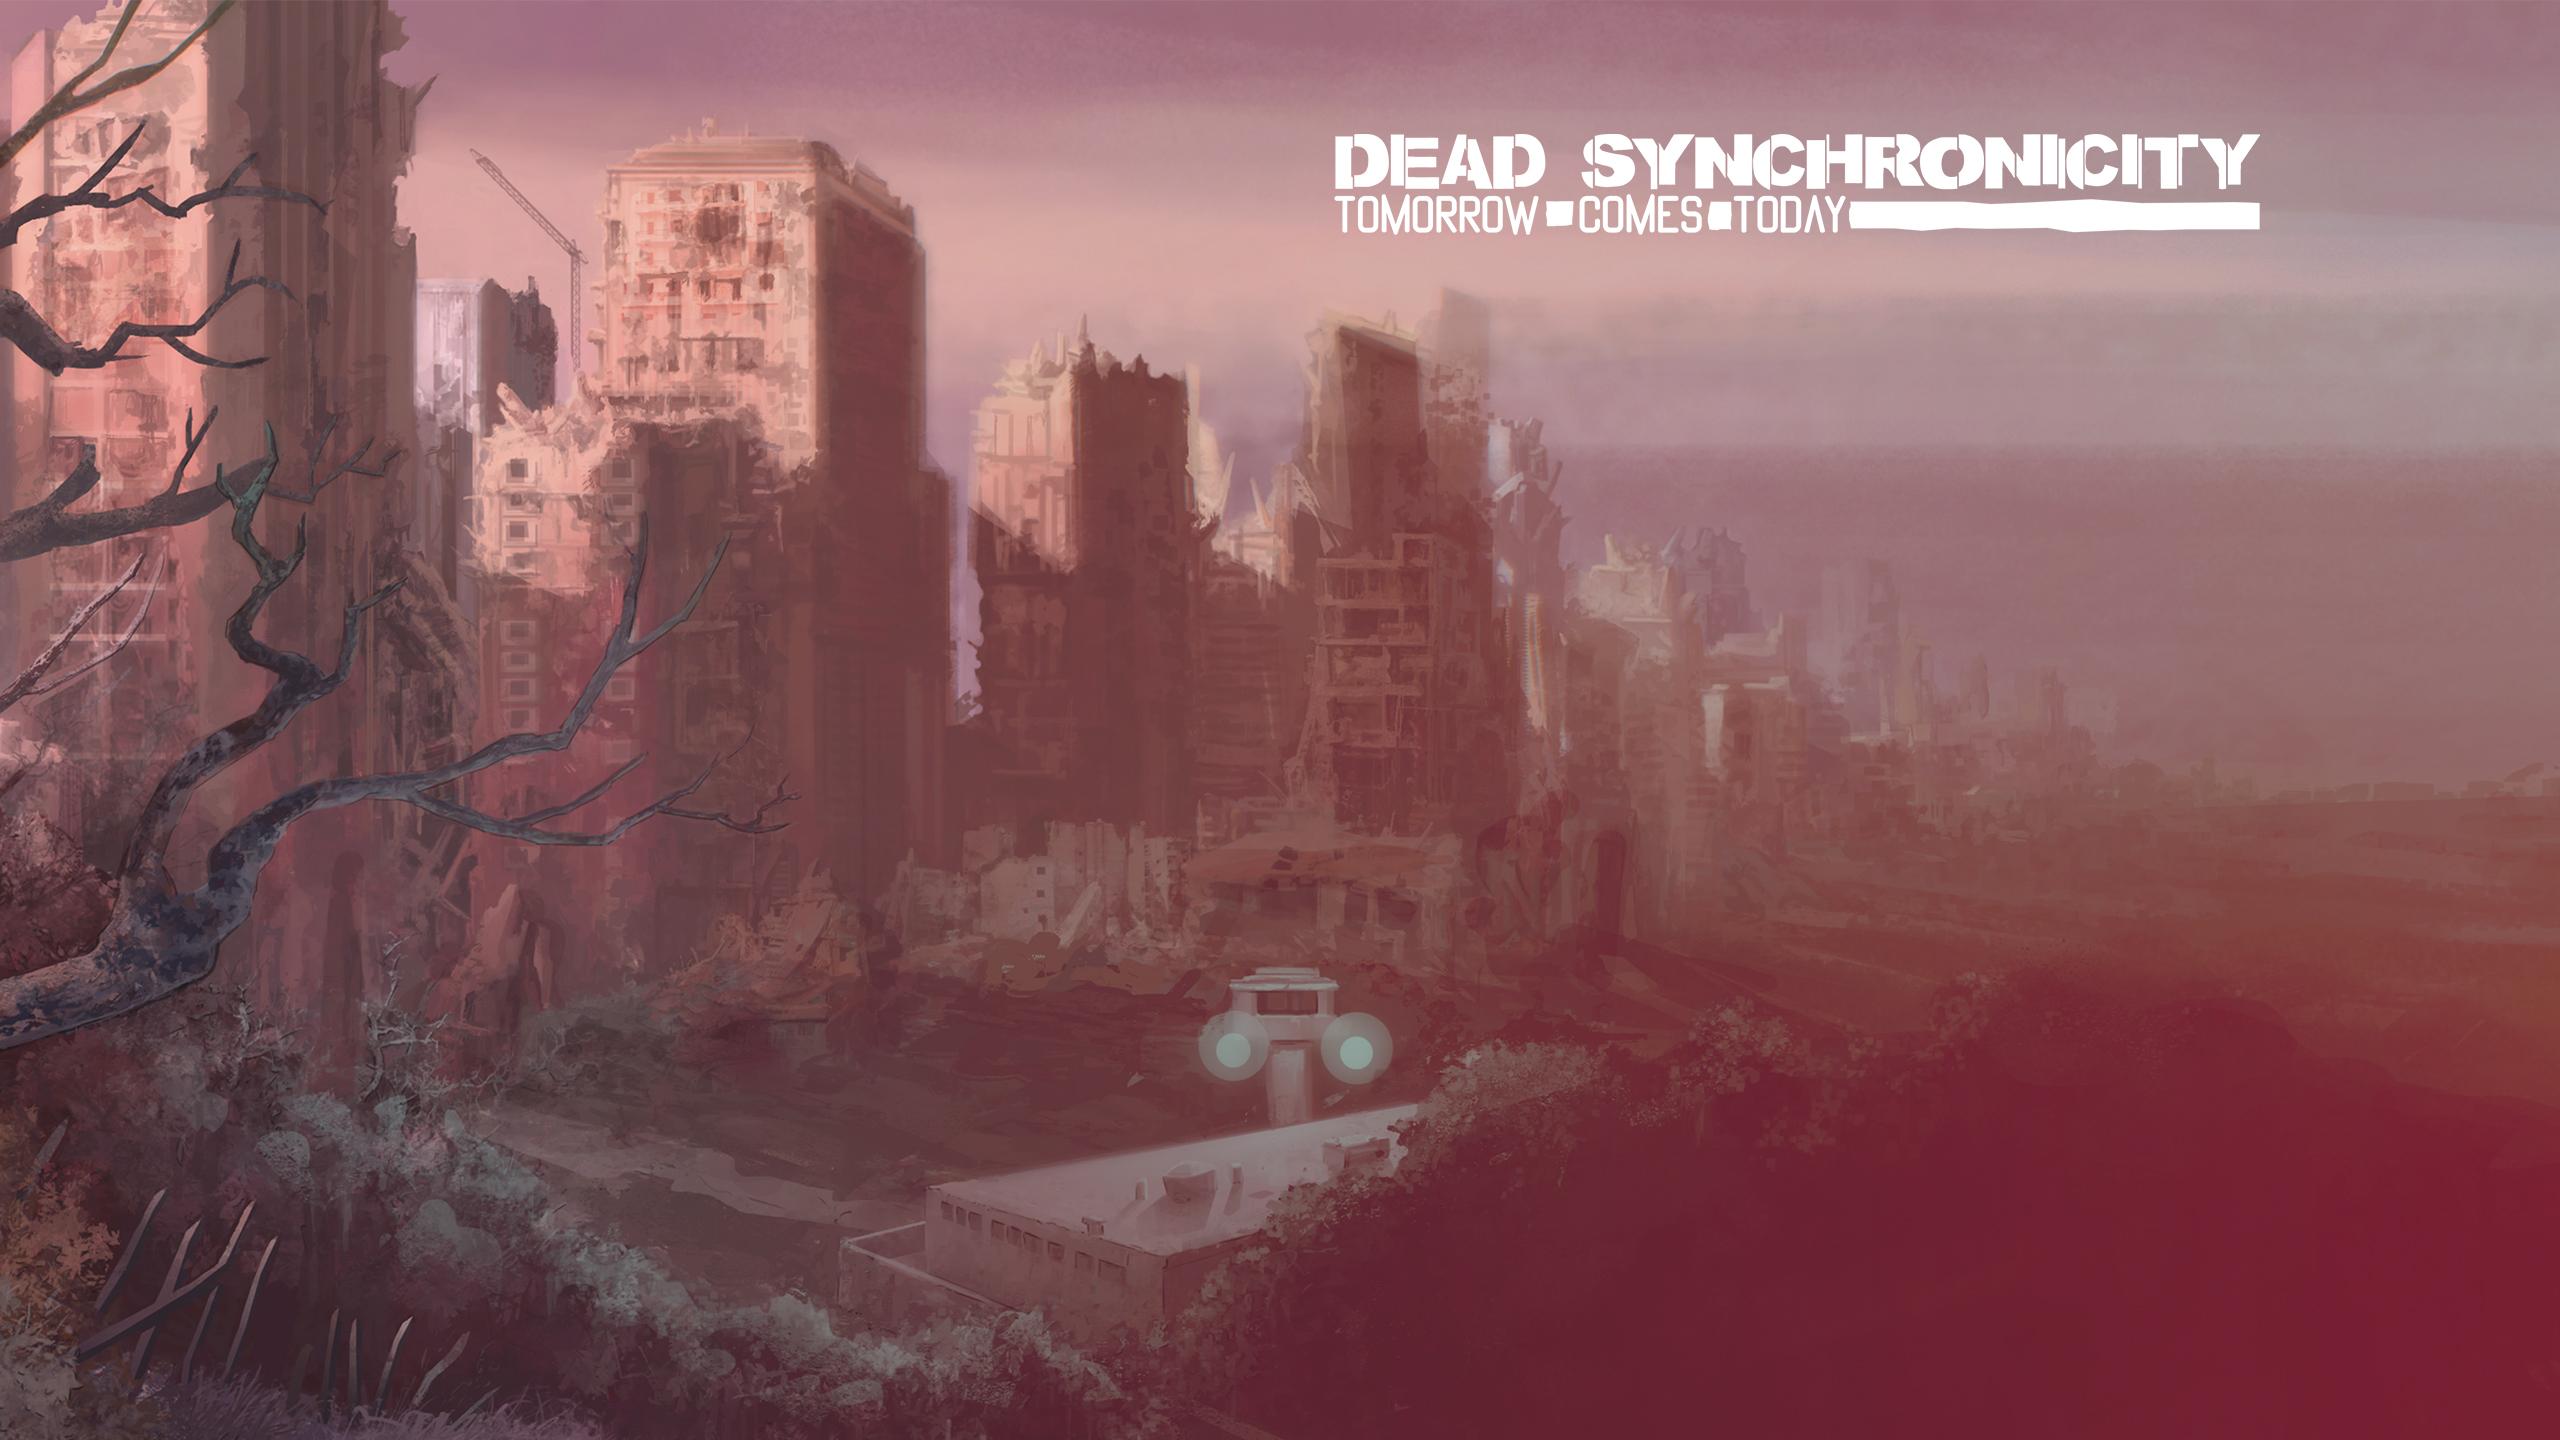 dead-synchronicity-wallpaper-03